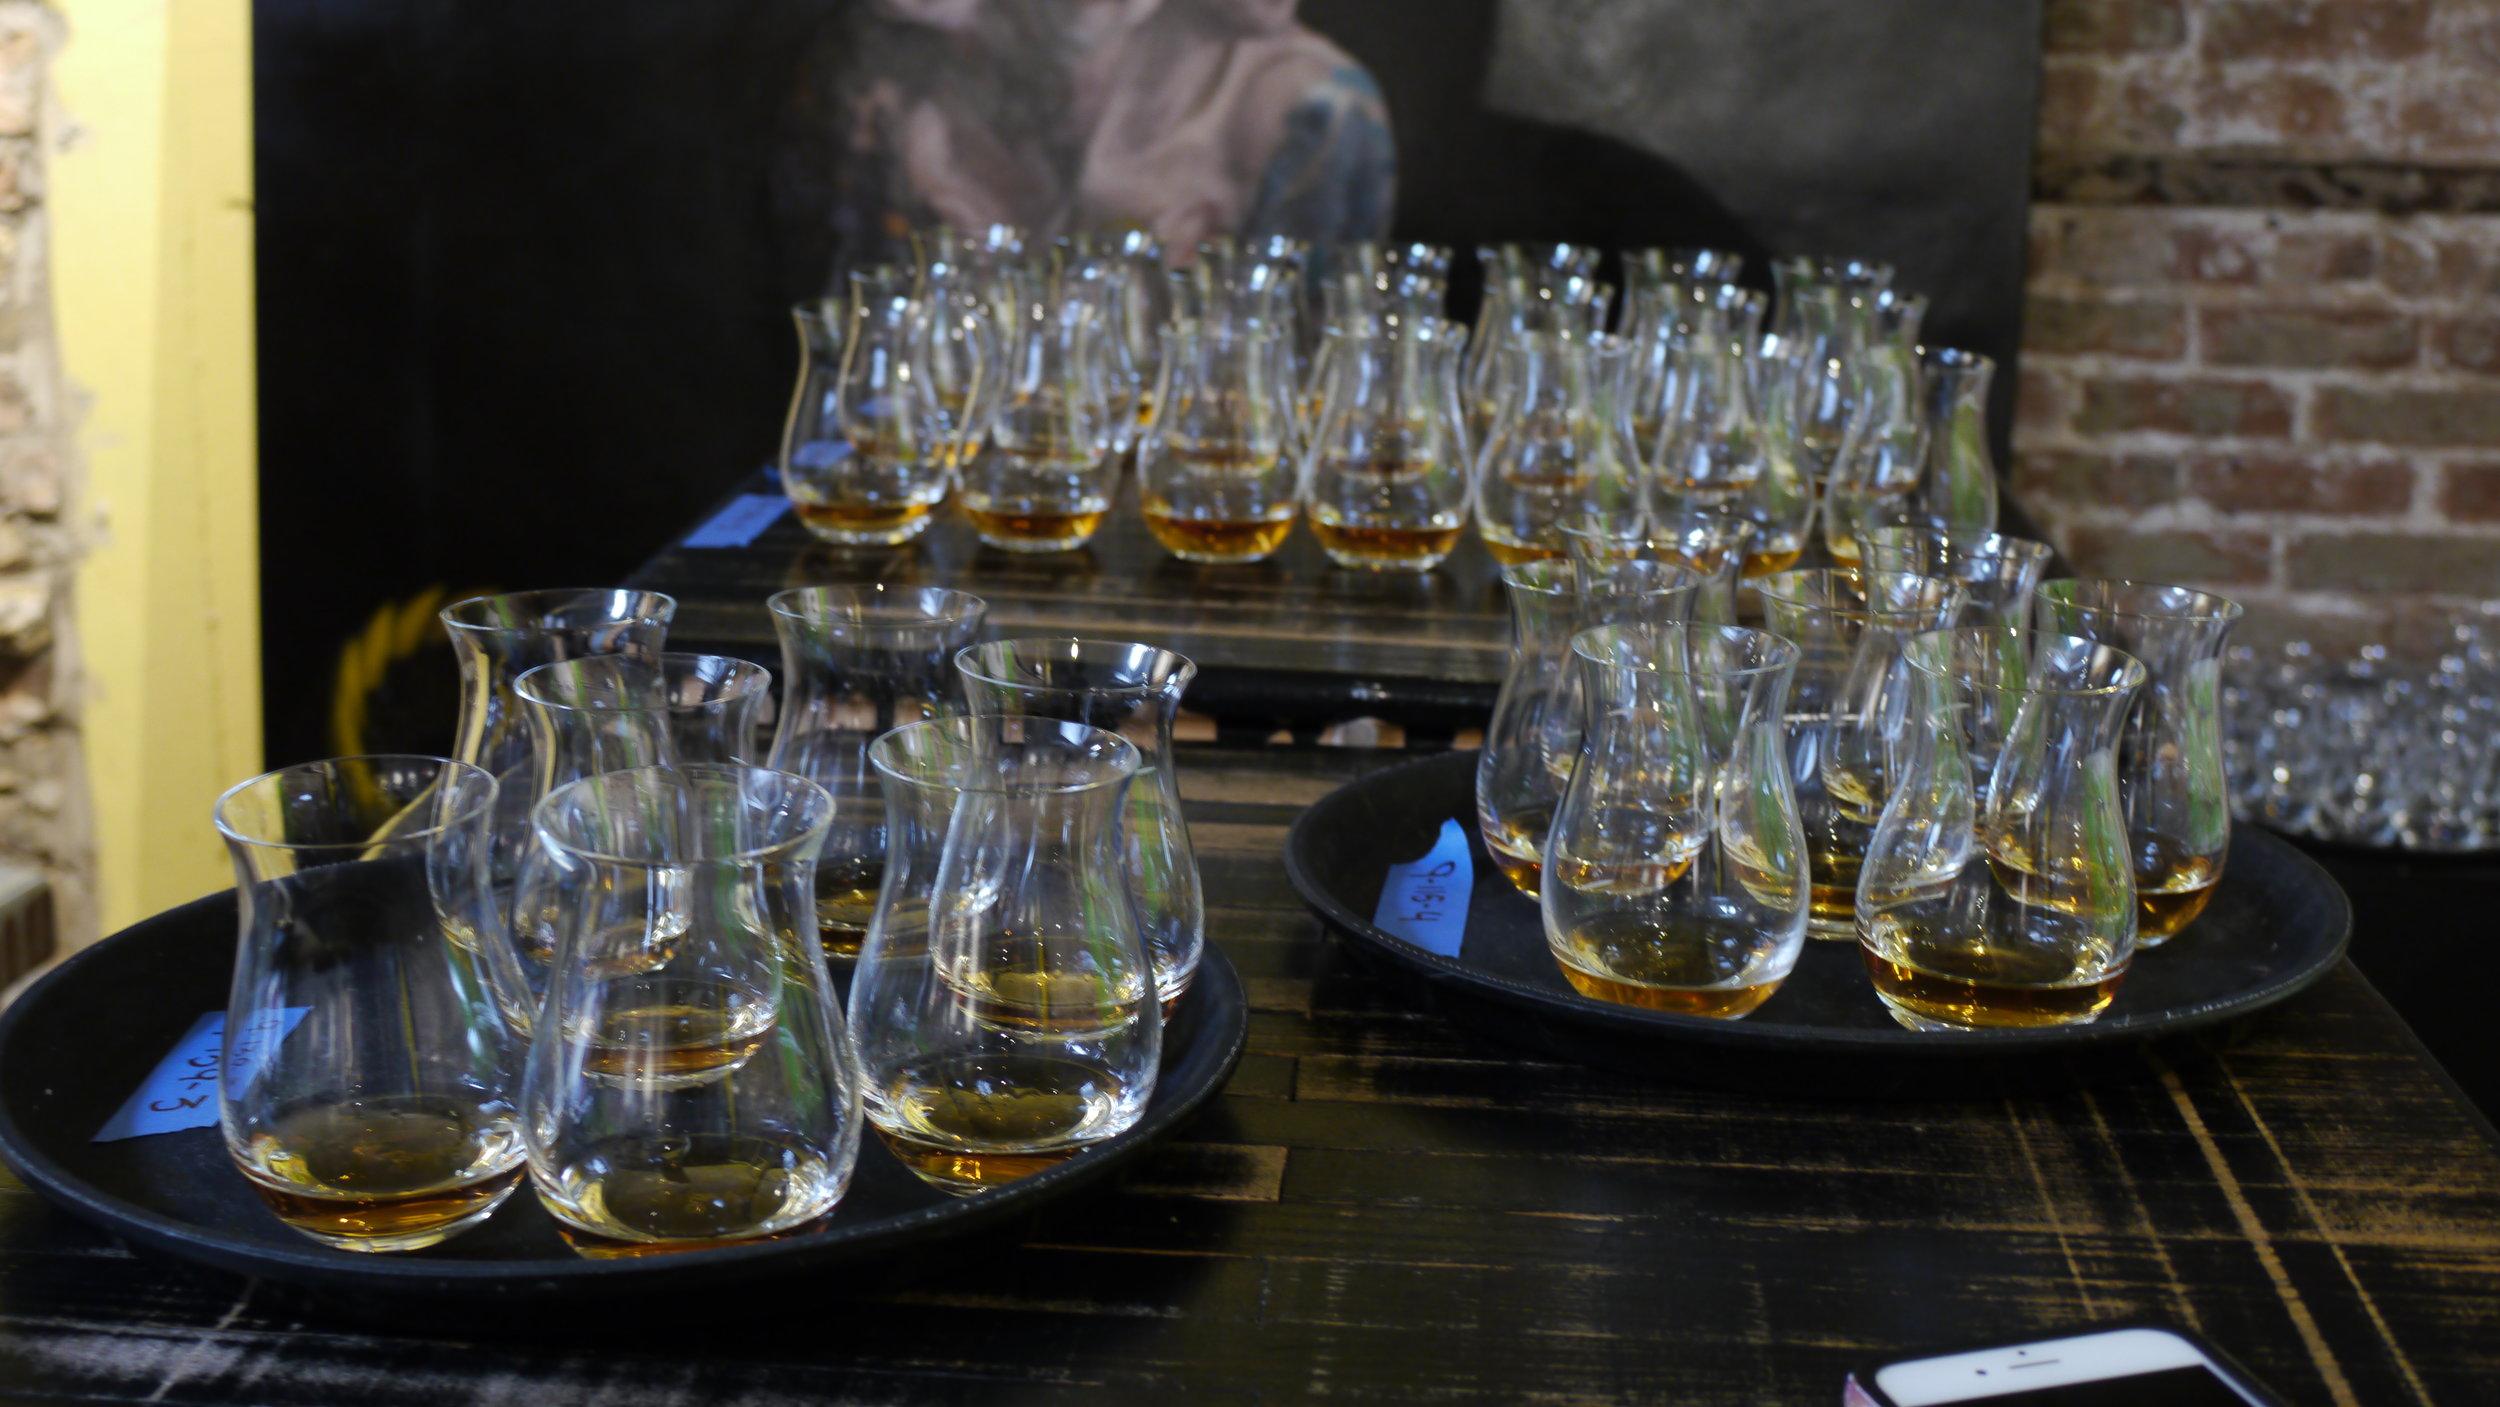 Blind whisky samples for the judges